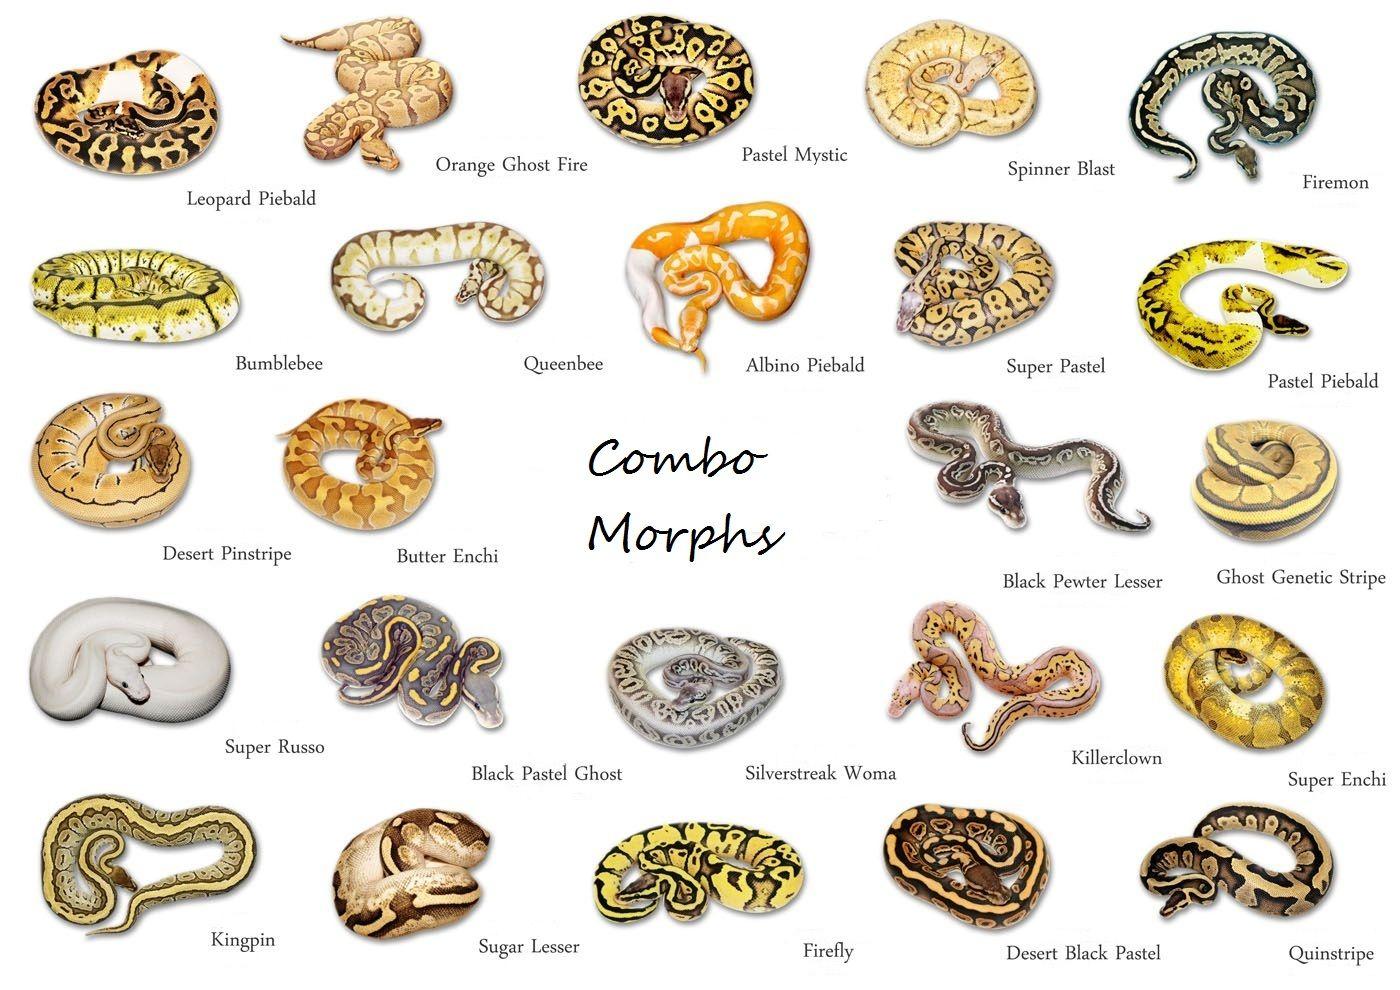 Pin By Kati Jackson On Herpetology Ball Python Morphs Ball Python Pet Ball Python Colors